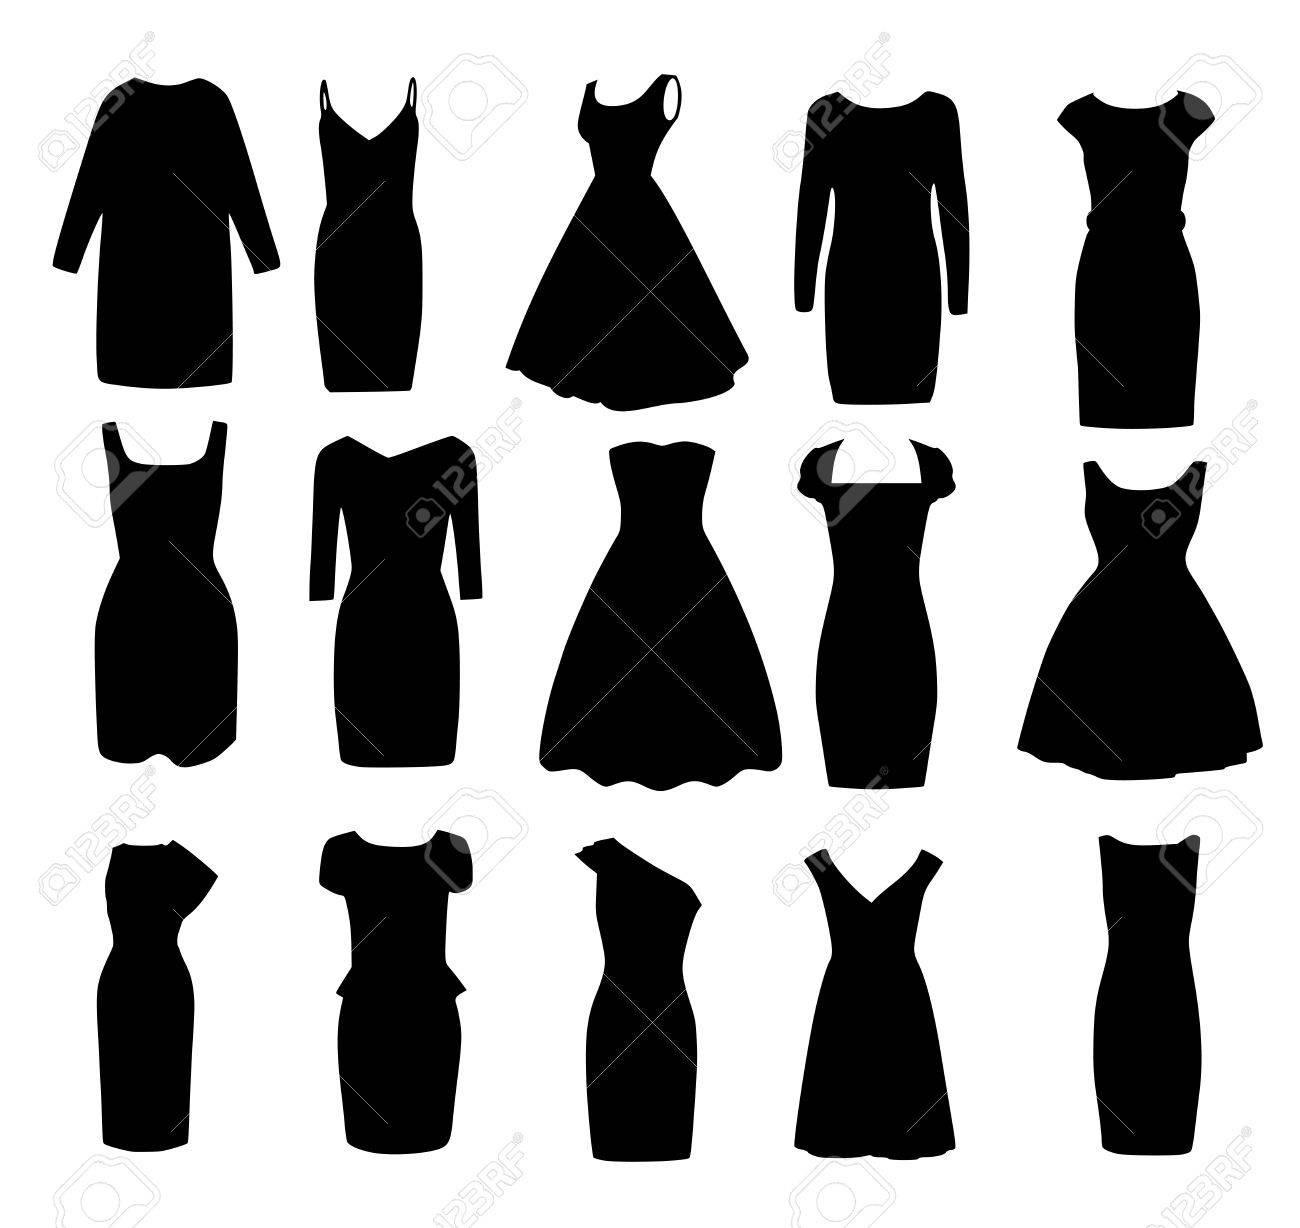 13 Wunderbar Abend Dress Vector Bester Preis Luxus Abend Dress Vector Galerie